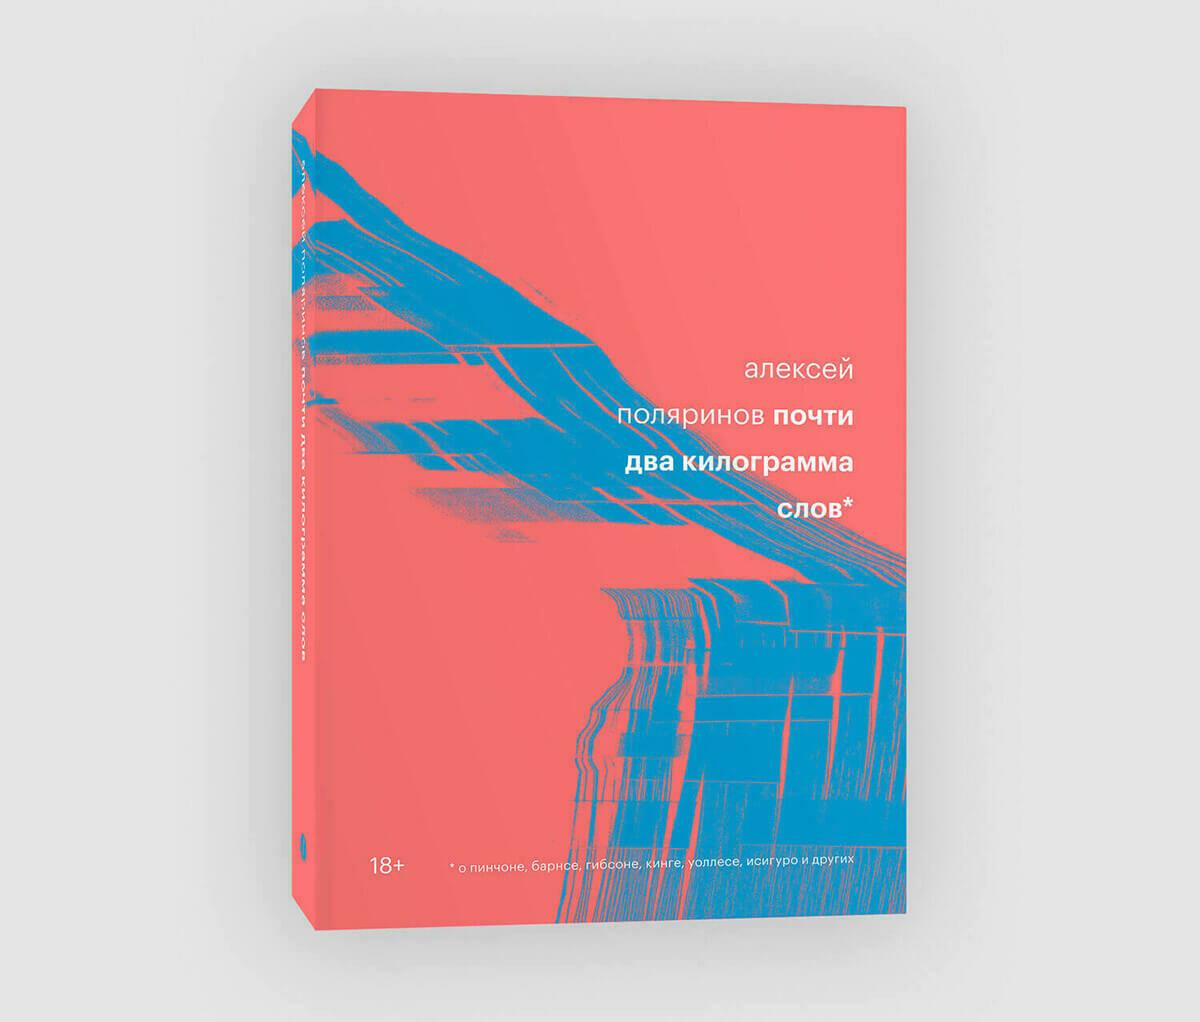 Книга «Почти два килограмма слов» Алексея Поляринова